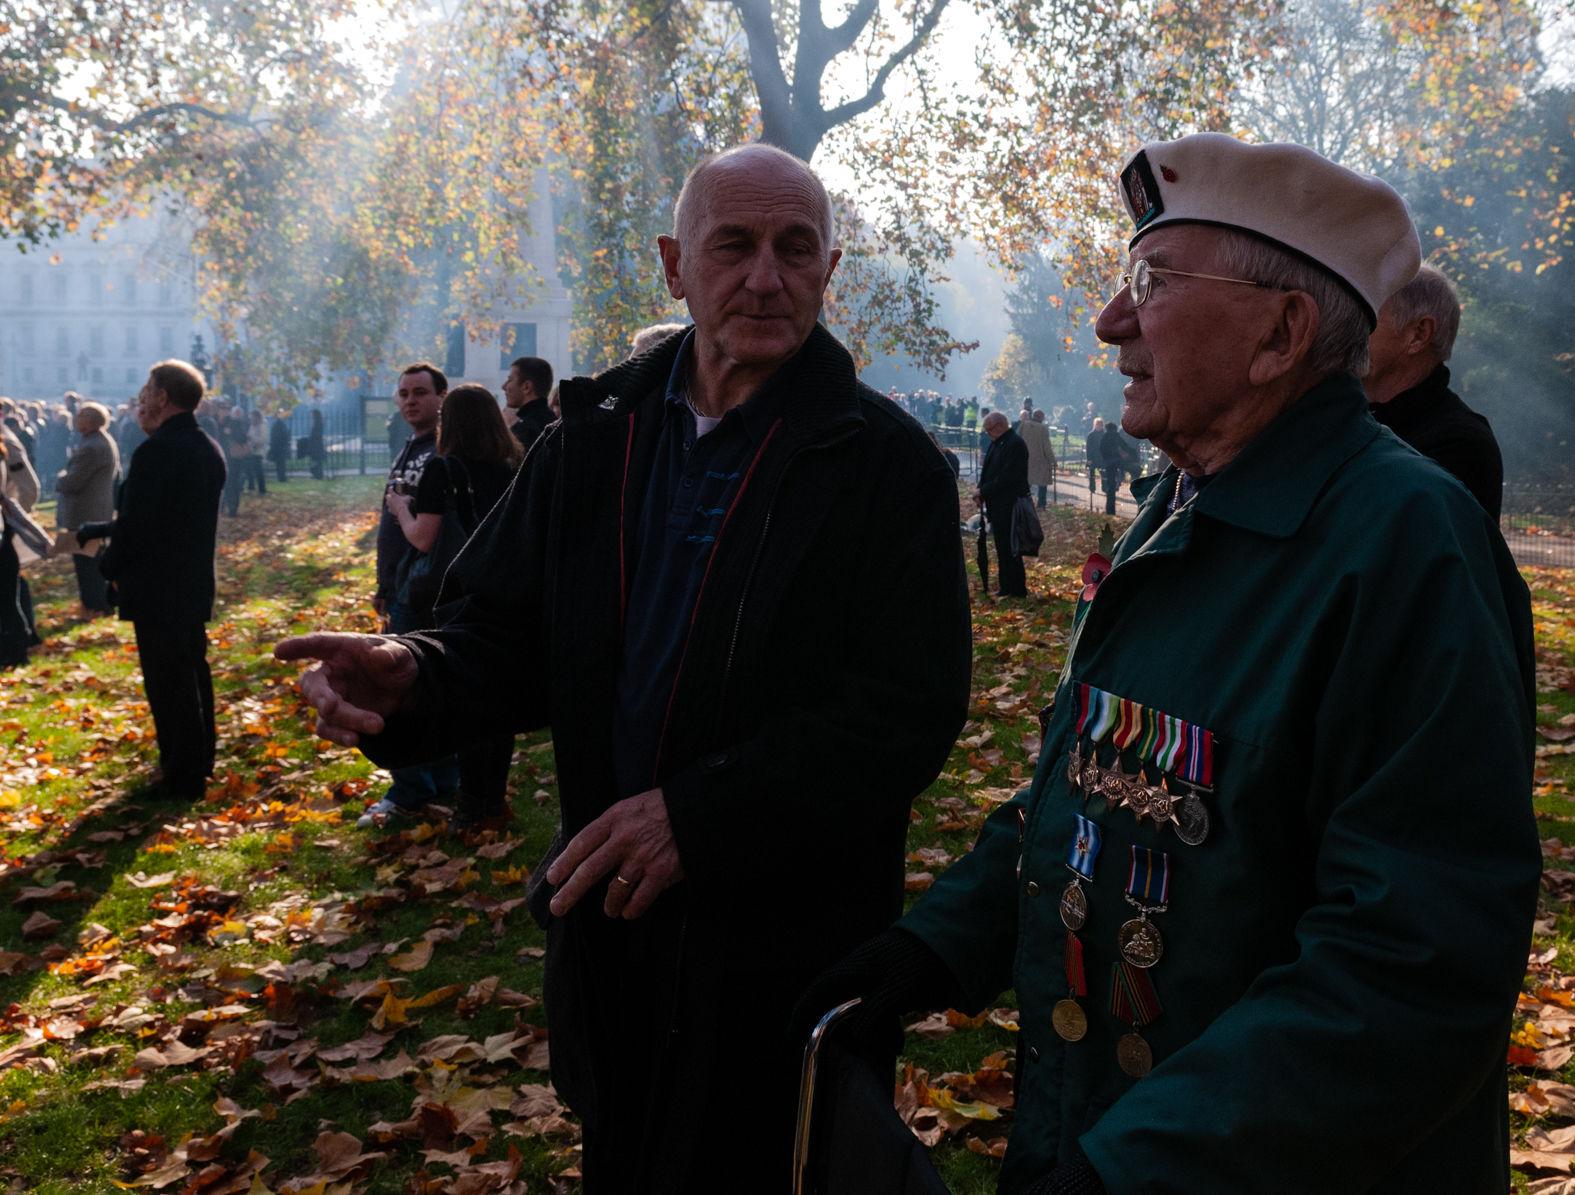 St James's Park, Remembrance Sunday